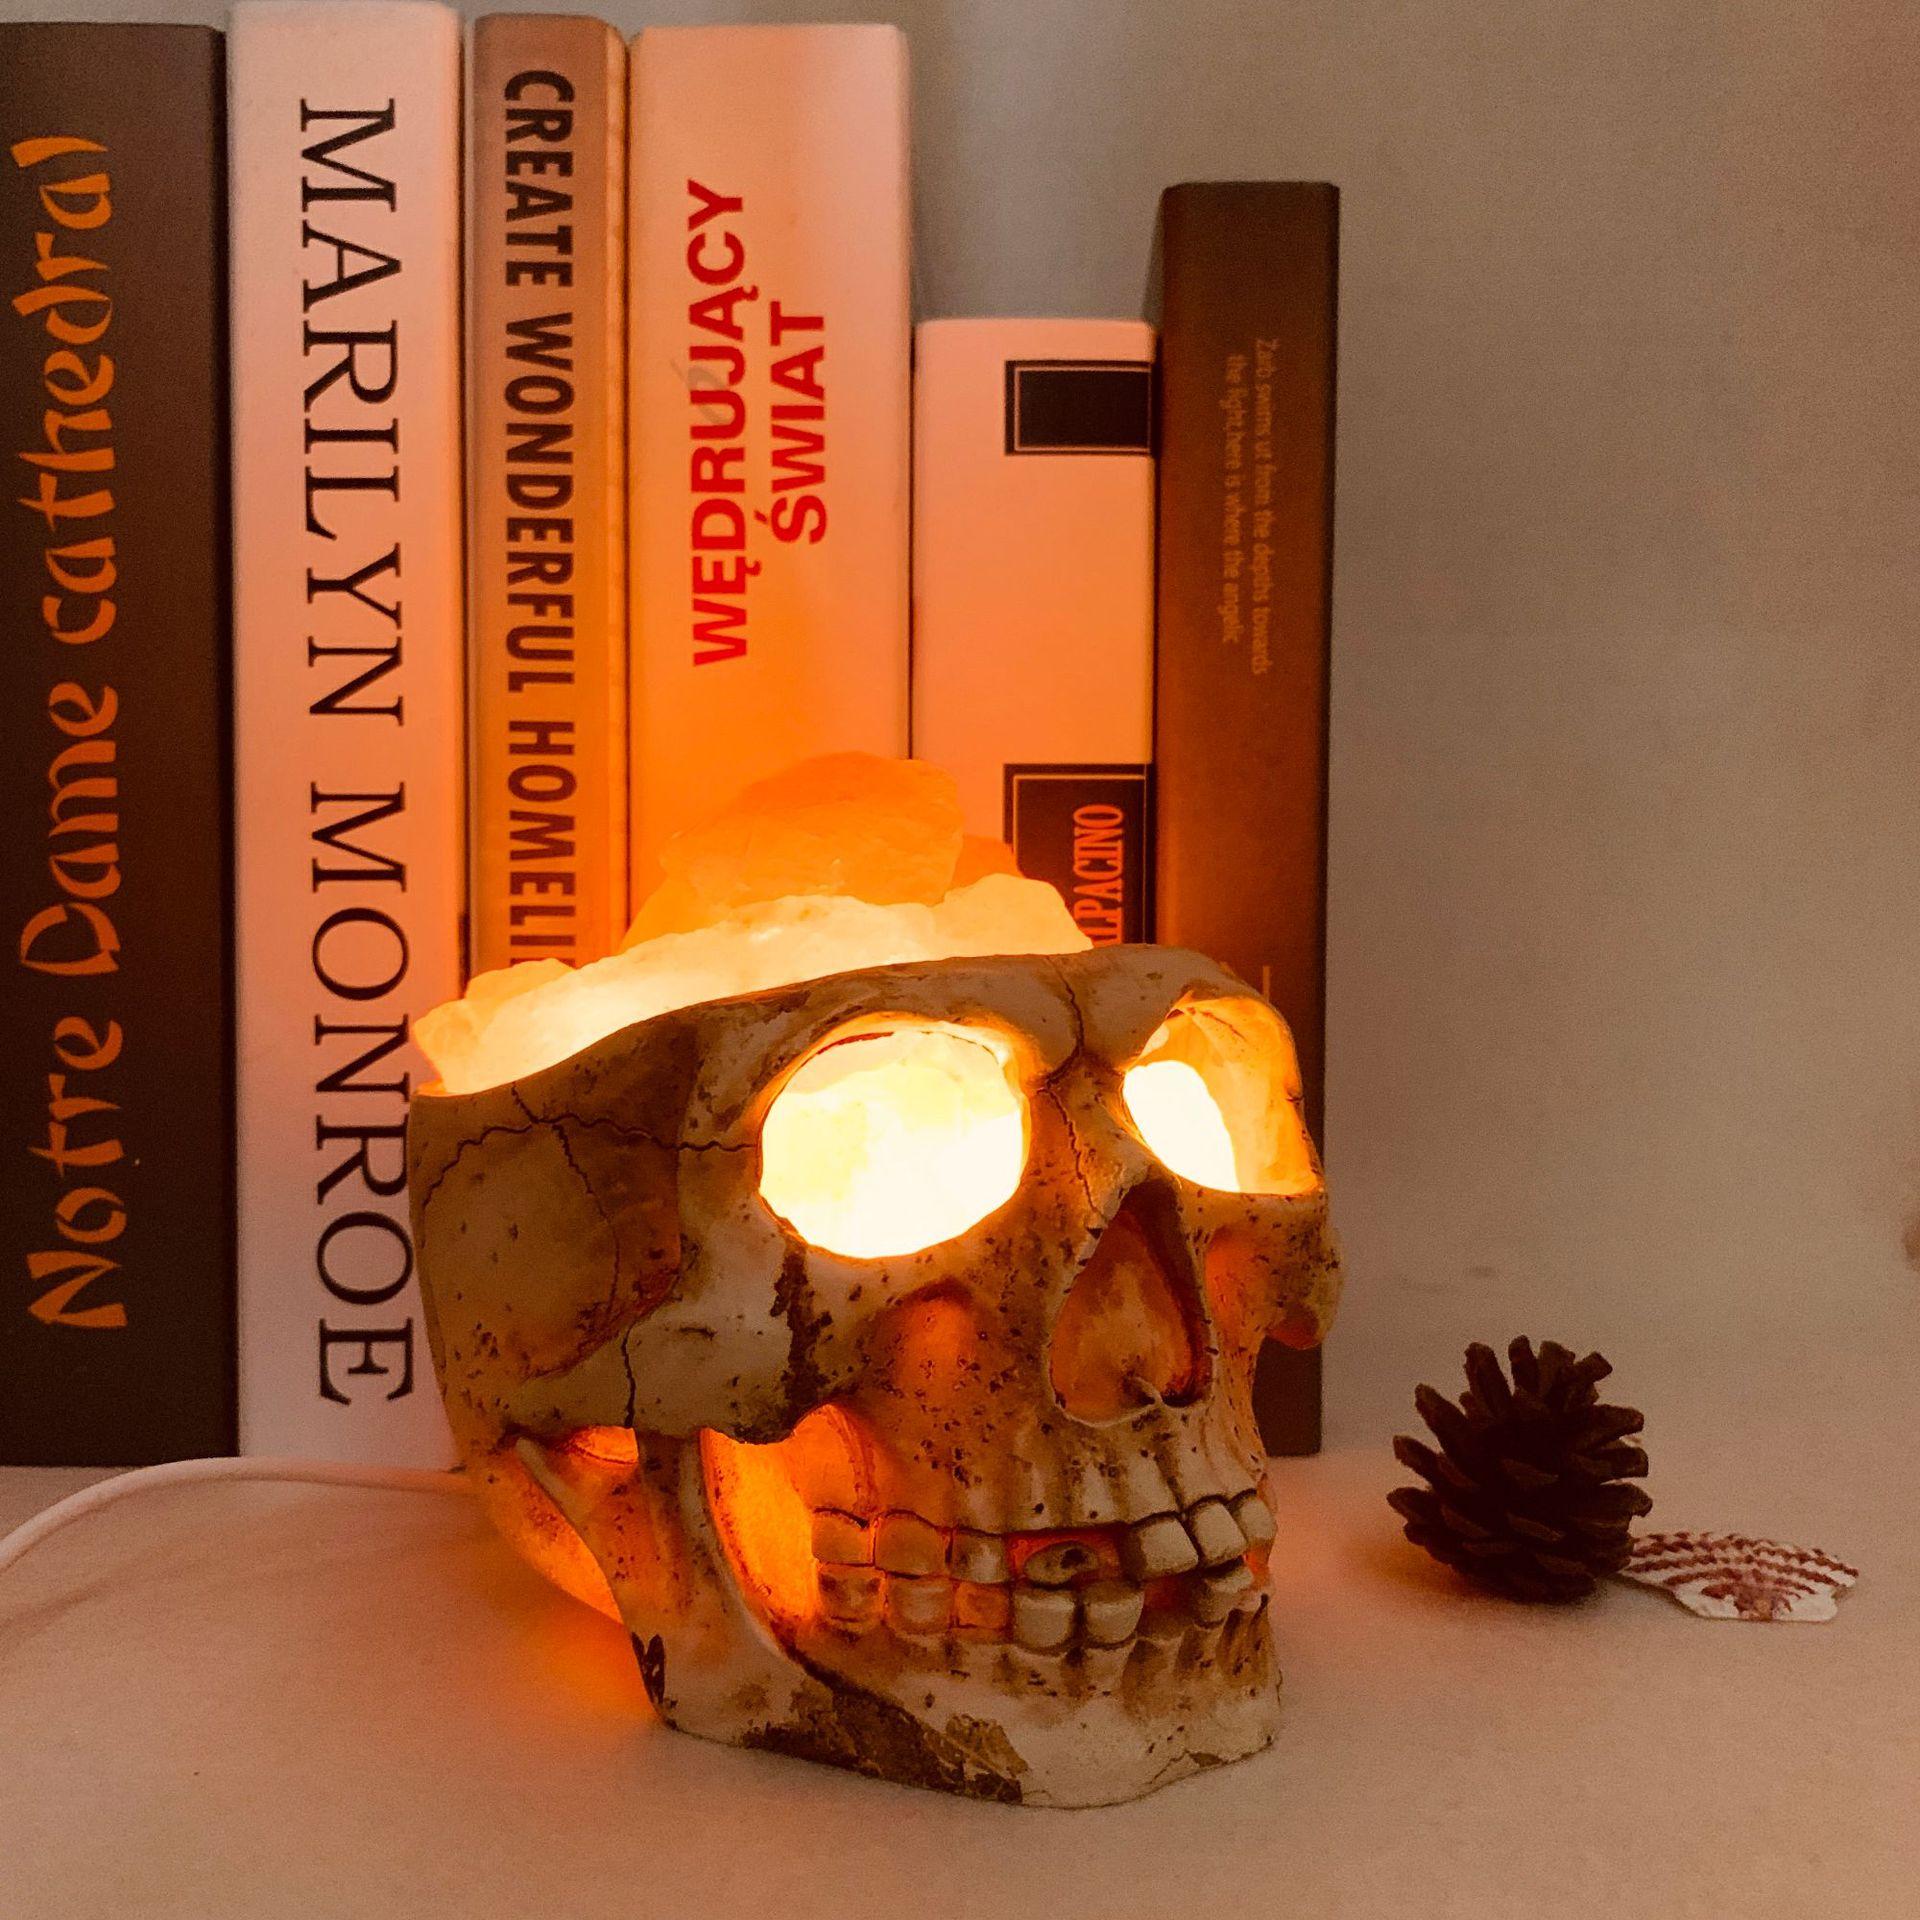 Veilleuse Halloween 3D crâne himalayen sel lampe USB Dimmable Lampara USB maison Bar café lumineux noël vacances créatif